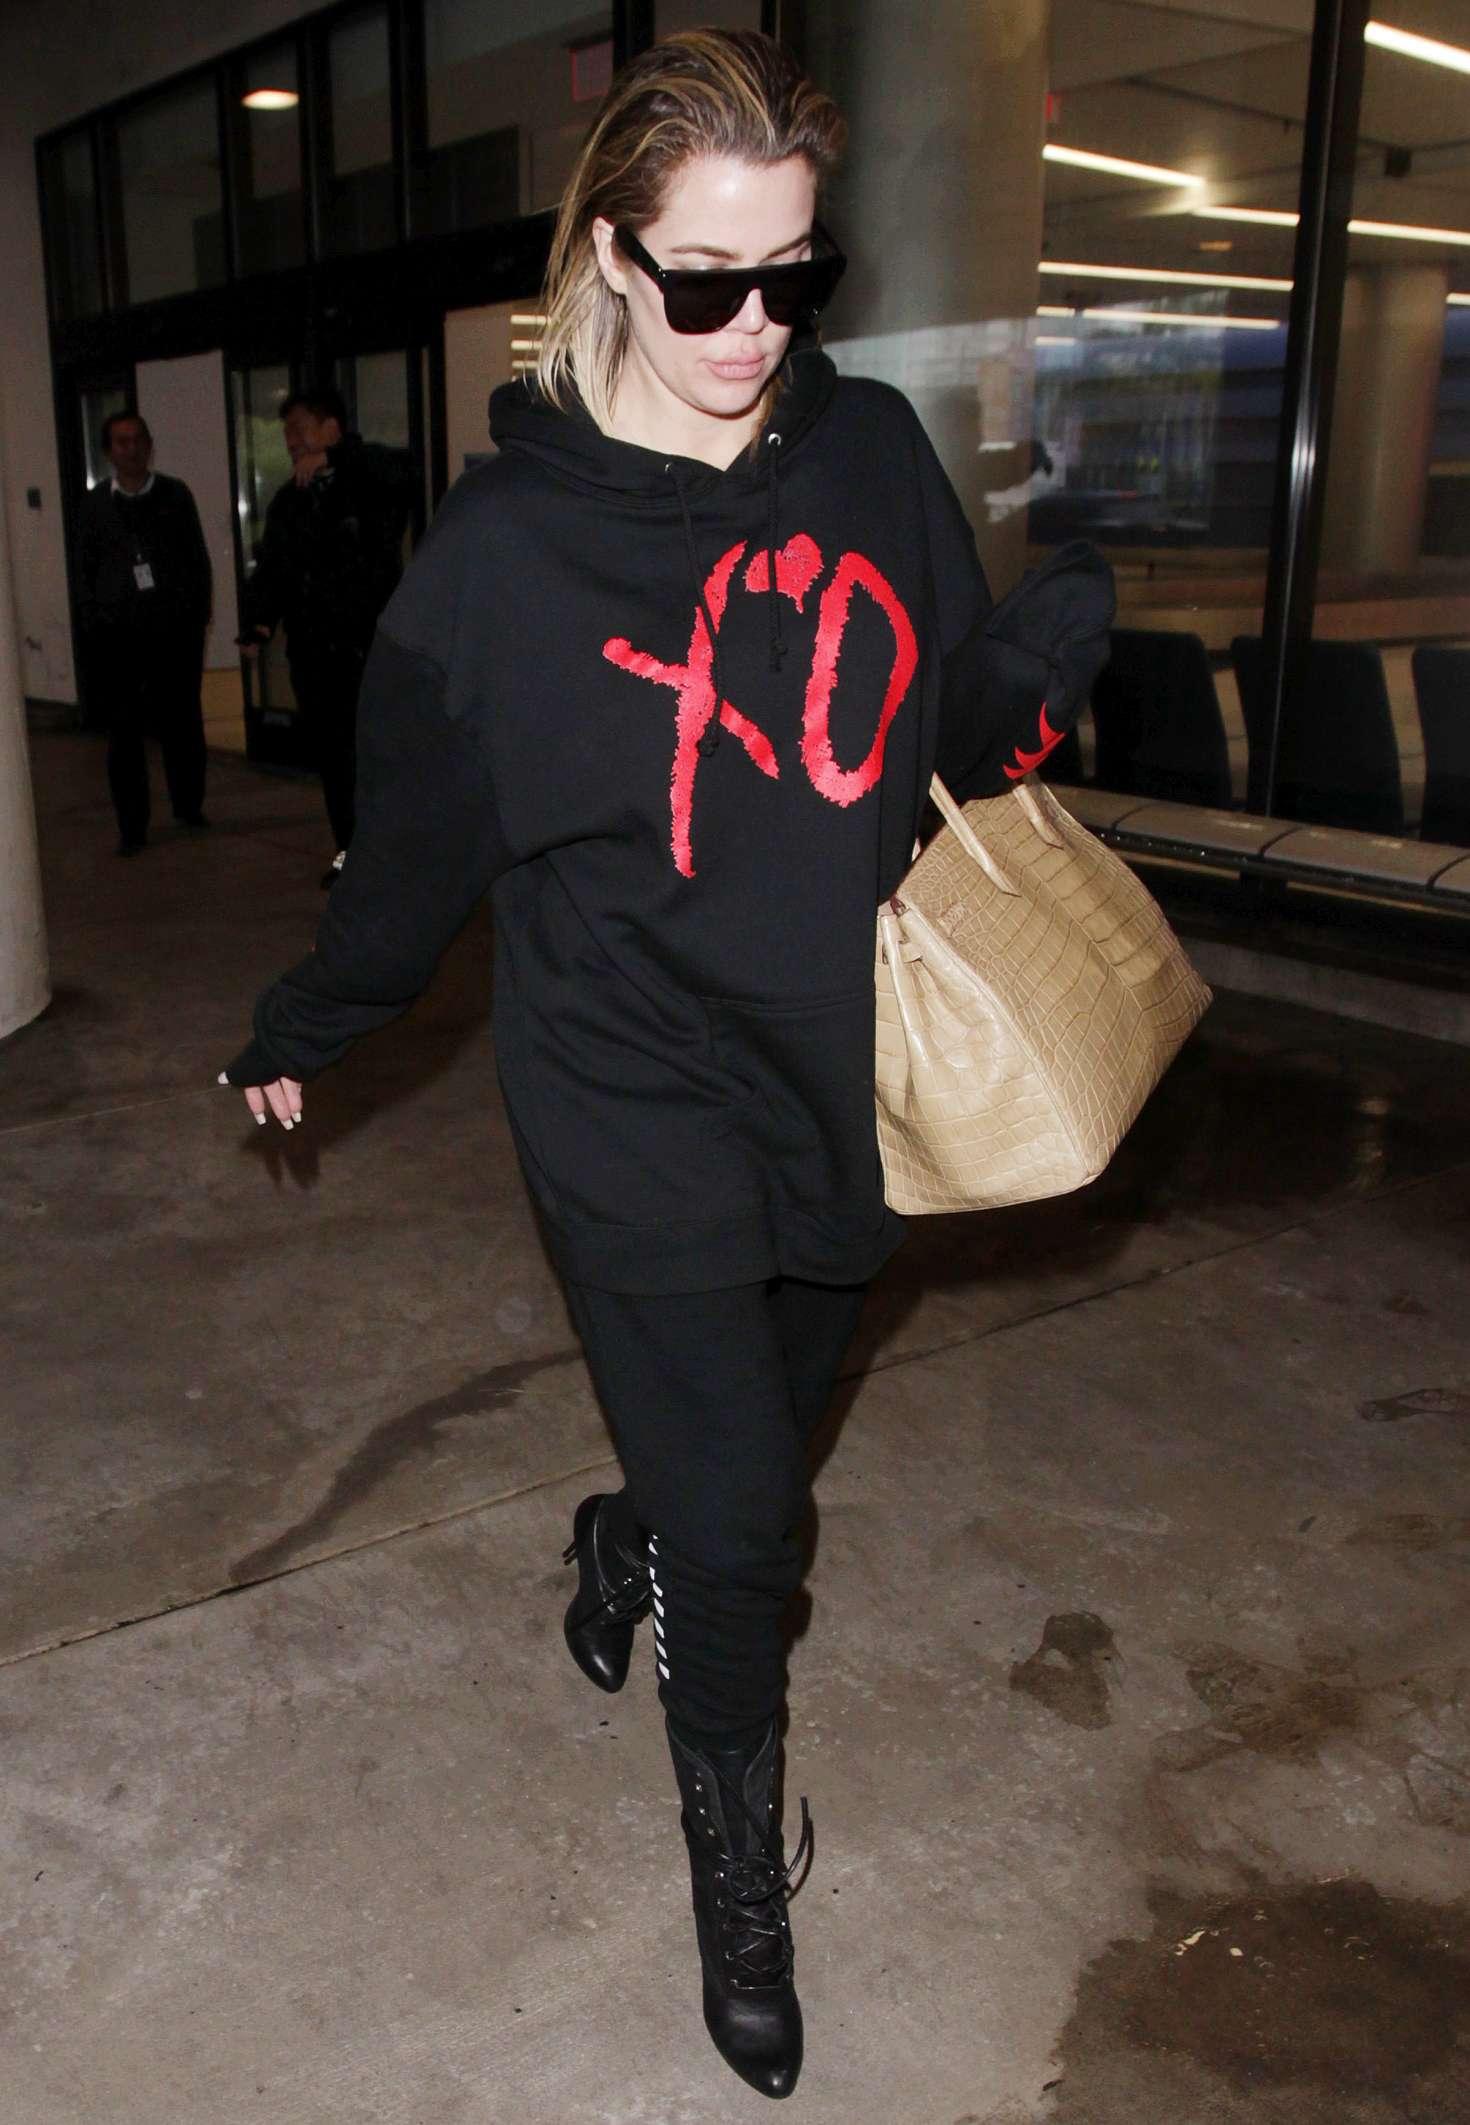 Khloe Kardashian - Arrives at the Los Angeles International Airport